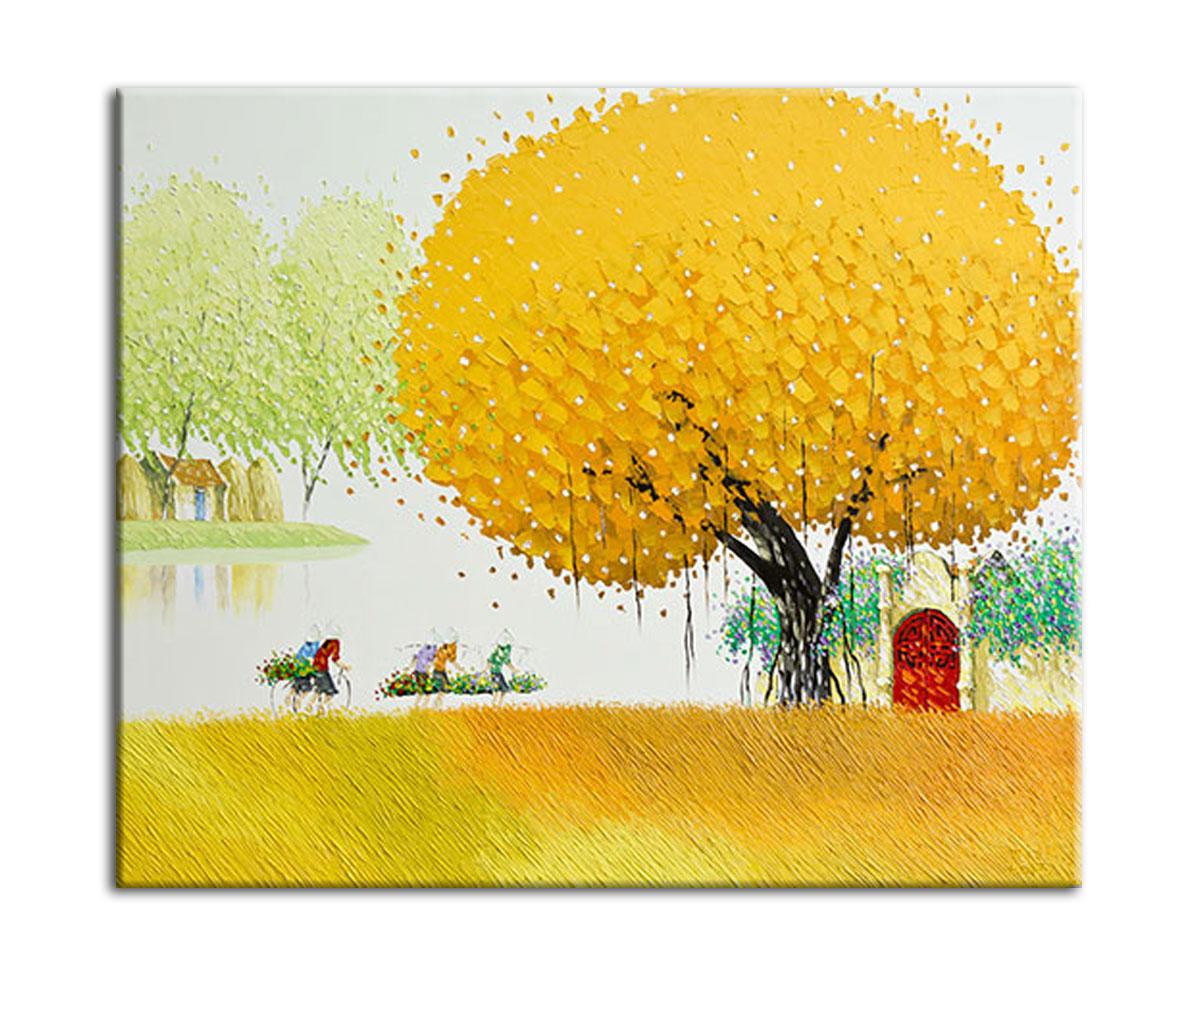 Muzante Картина Урожайный день